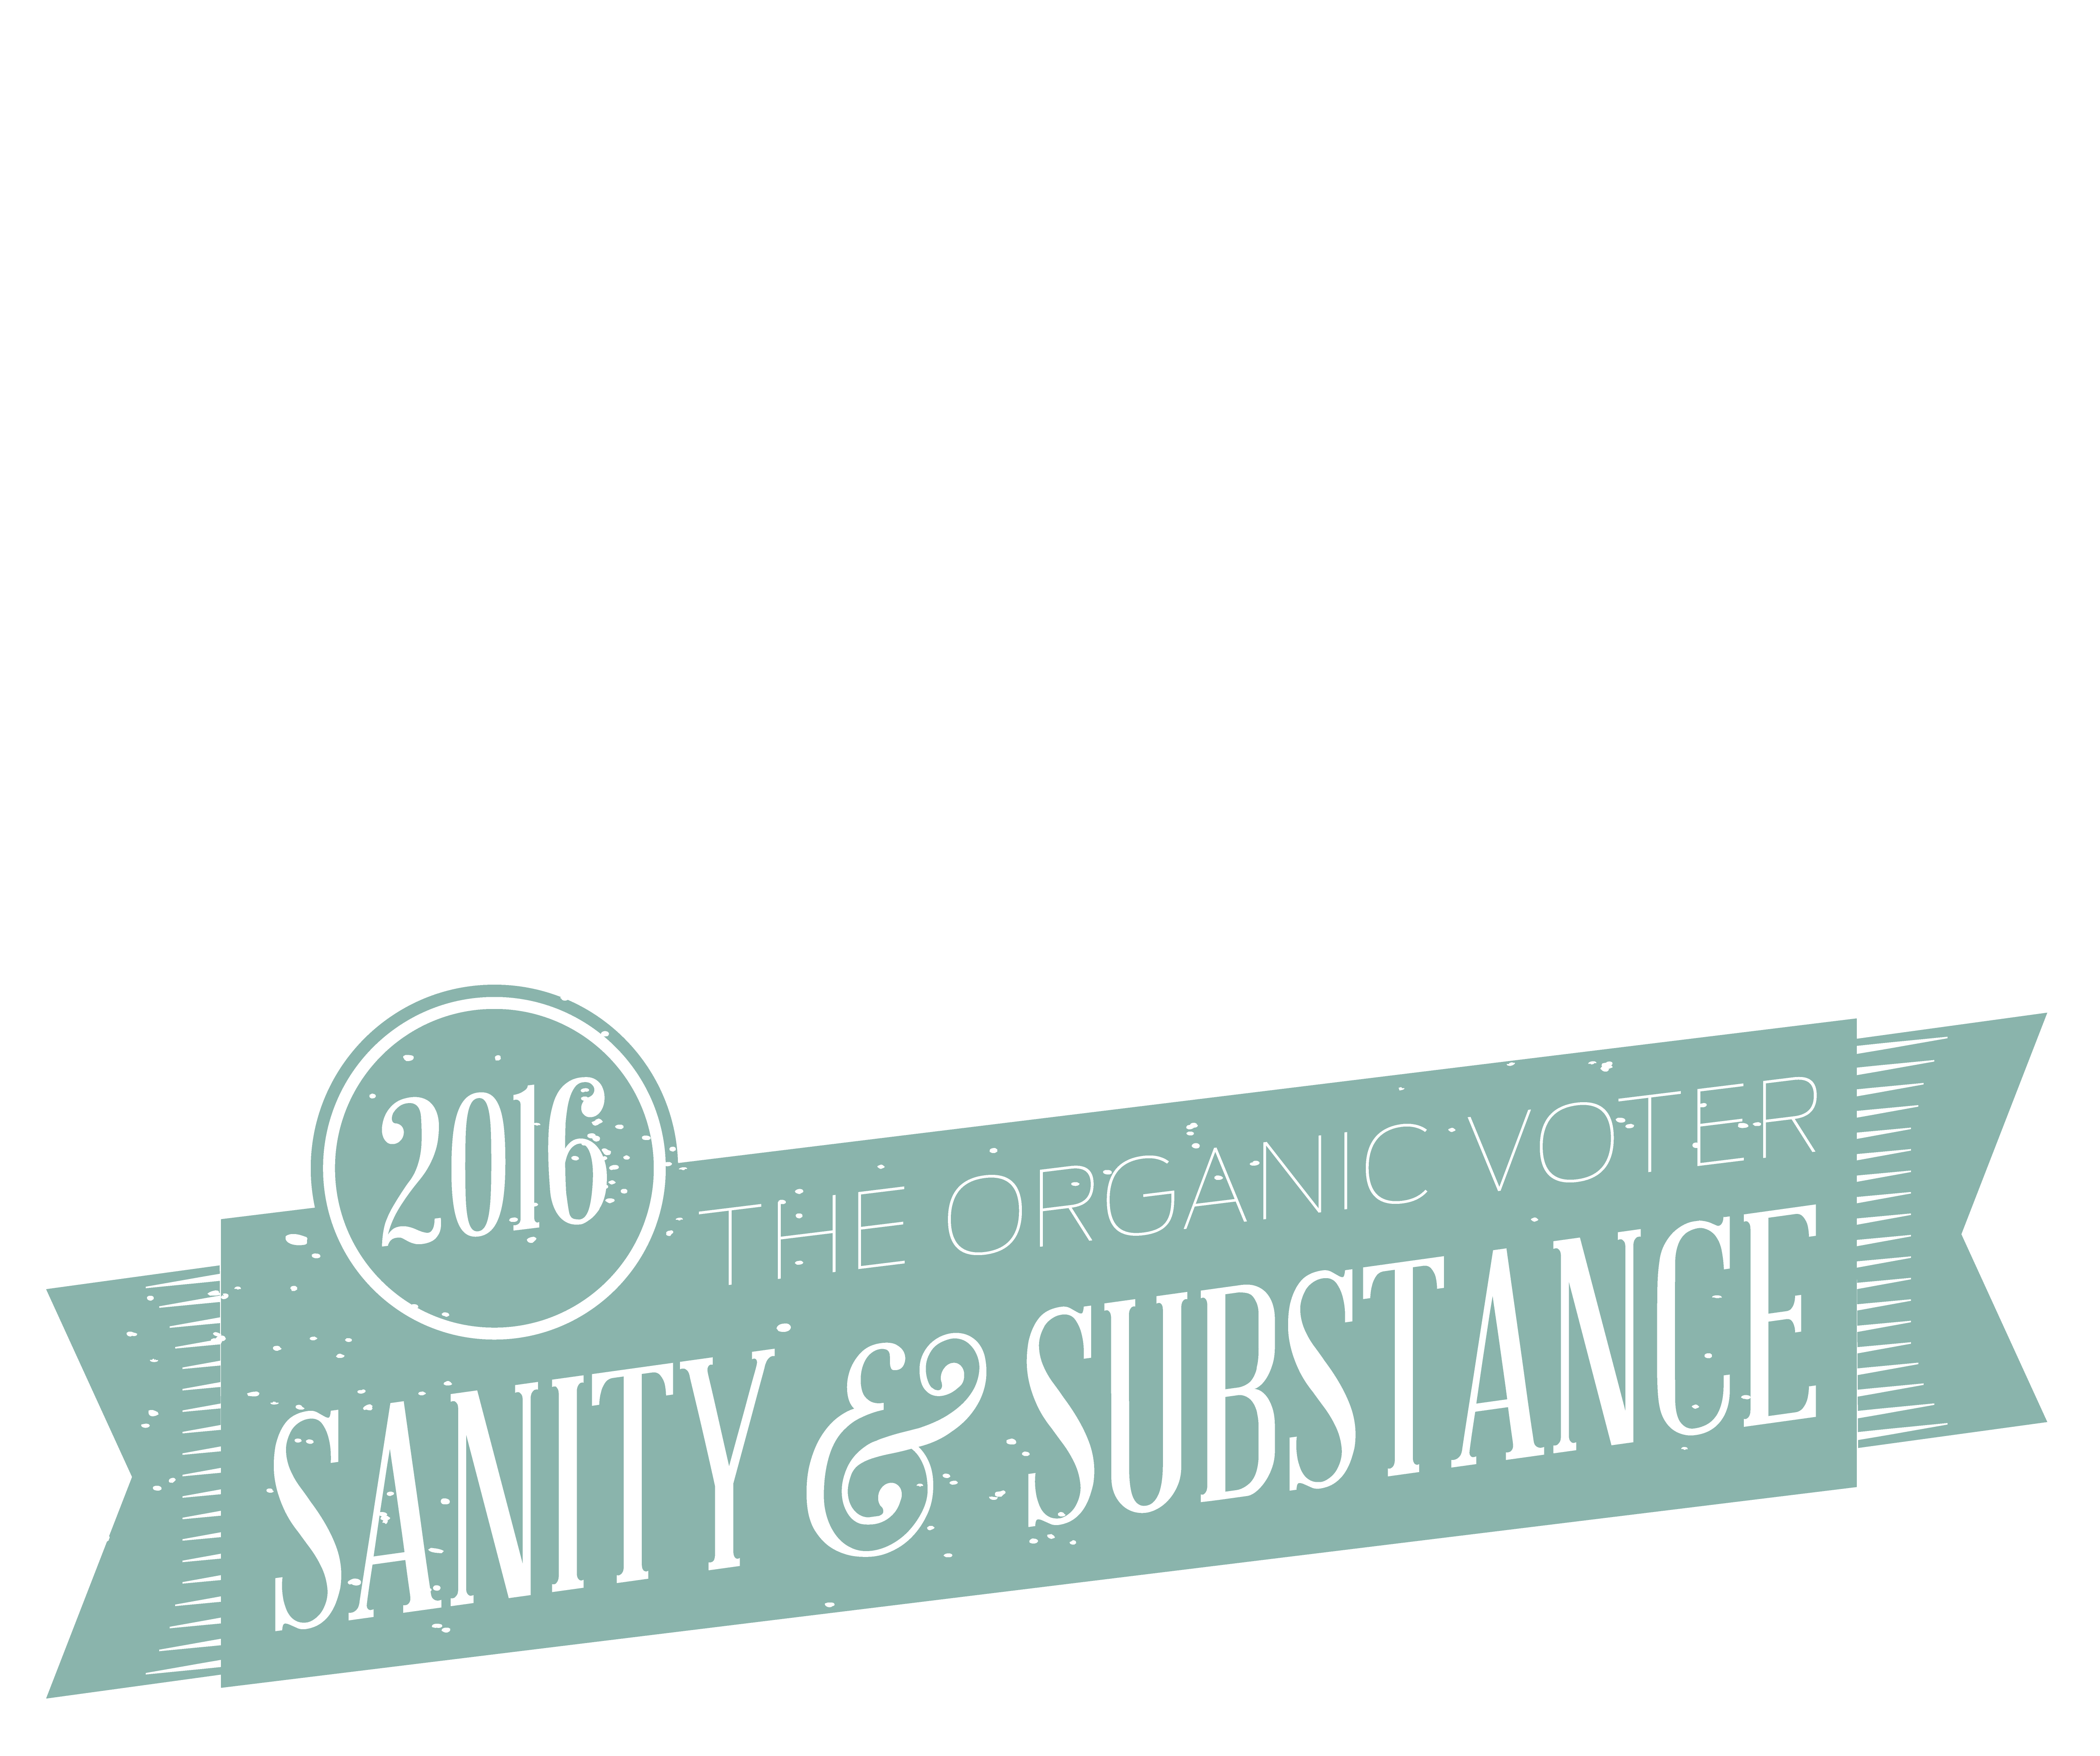 Sanity & Substance 2016 logo